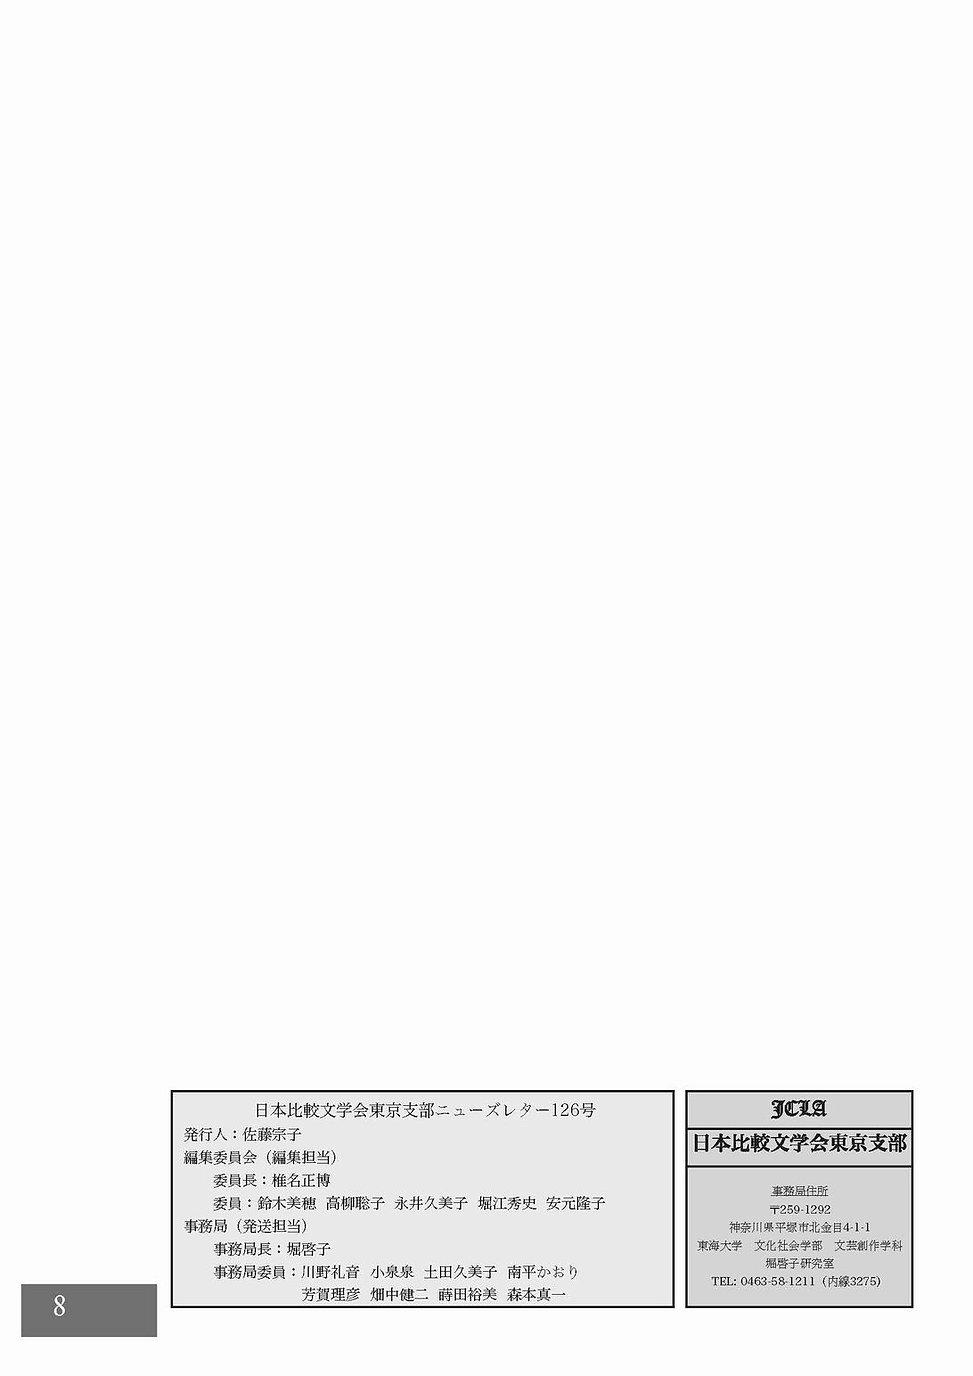 57a8.jpg